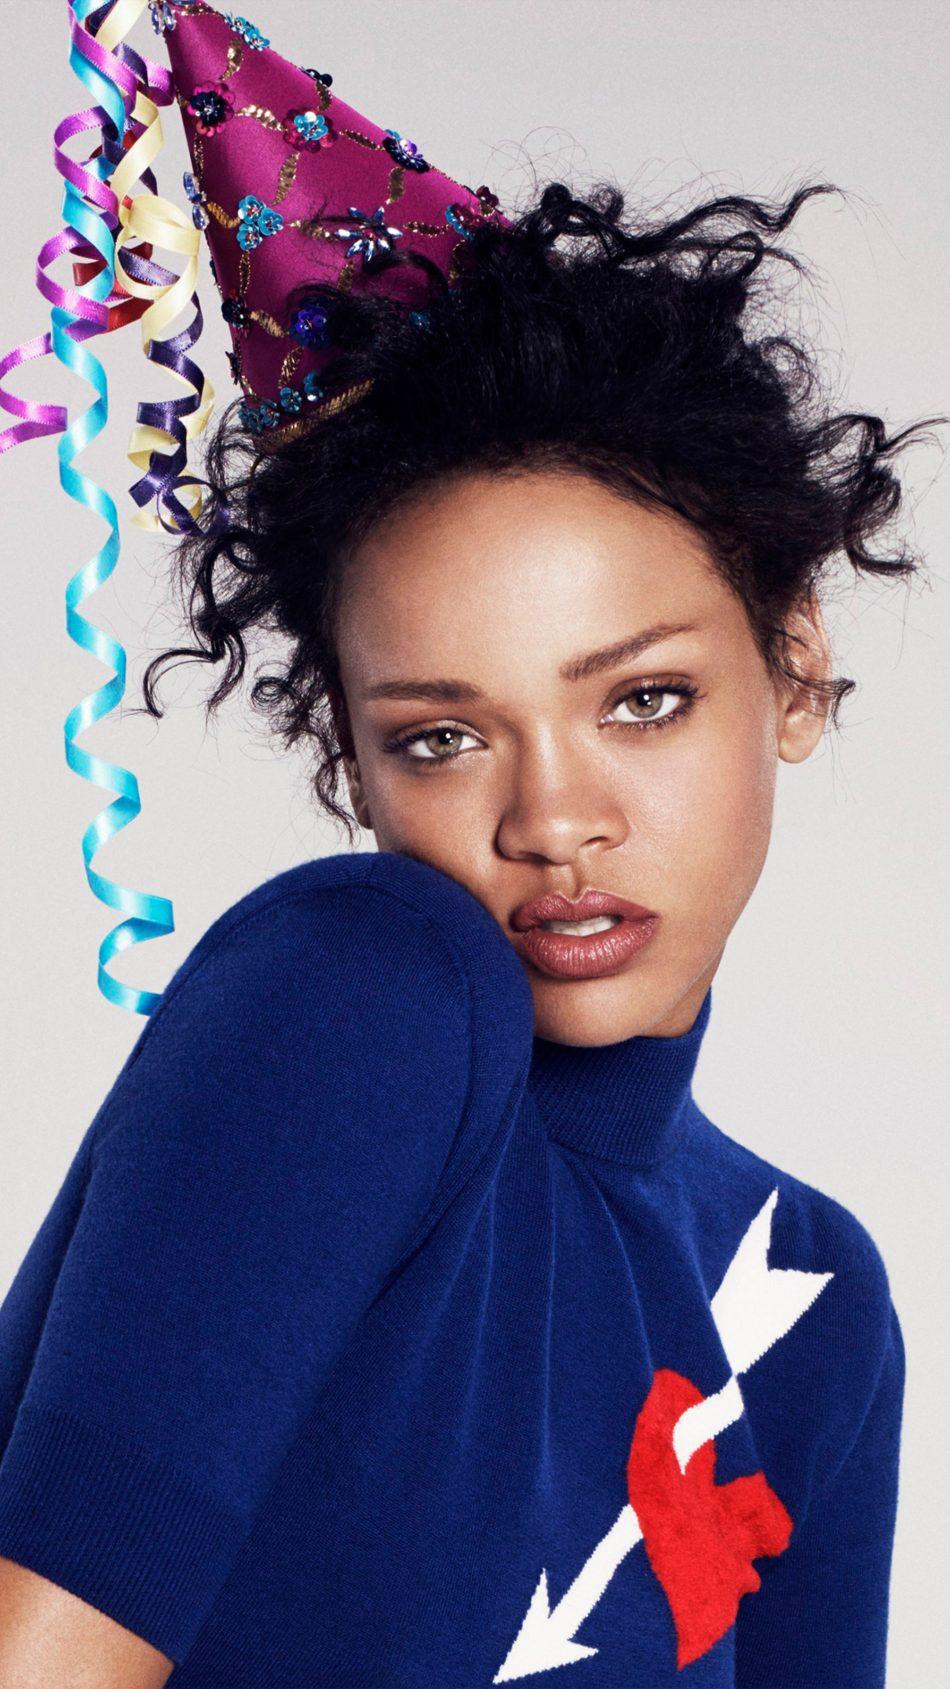 Rihanna Party Hat 4K Ultra HD Mobile Wallpaper